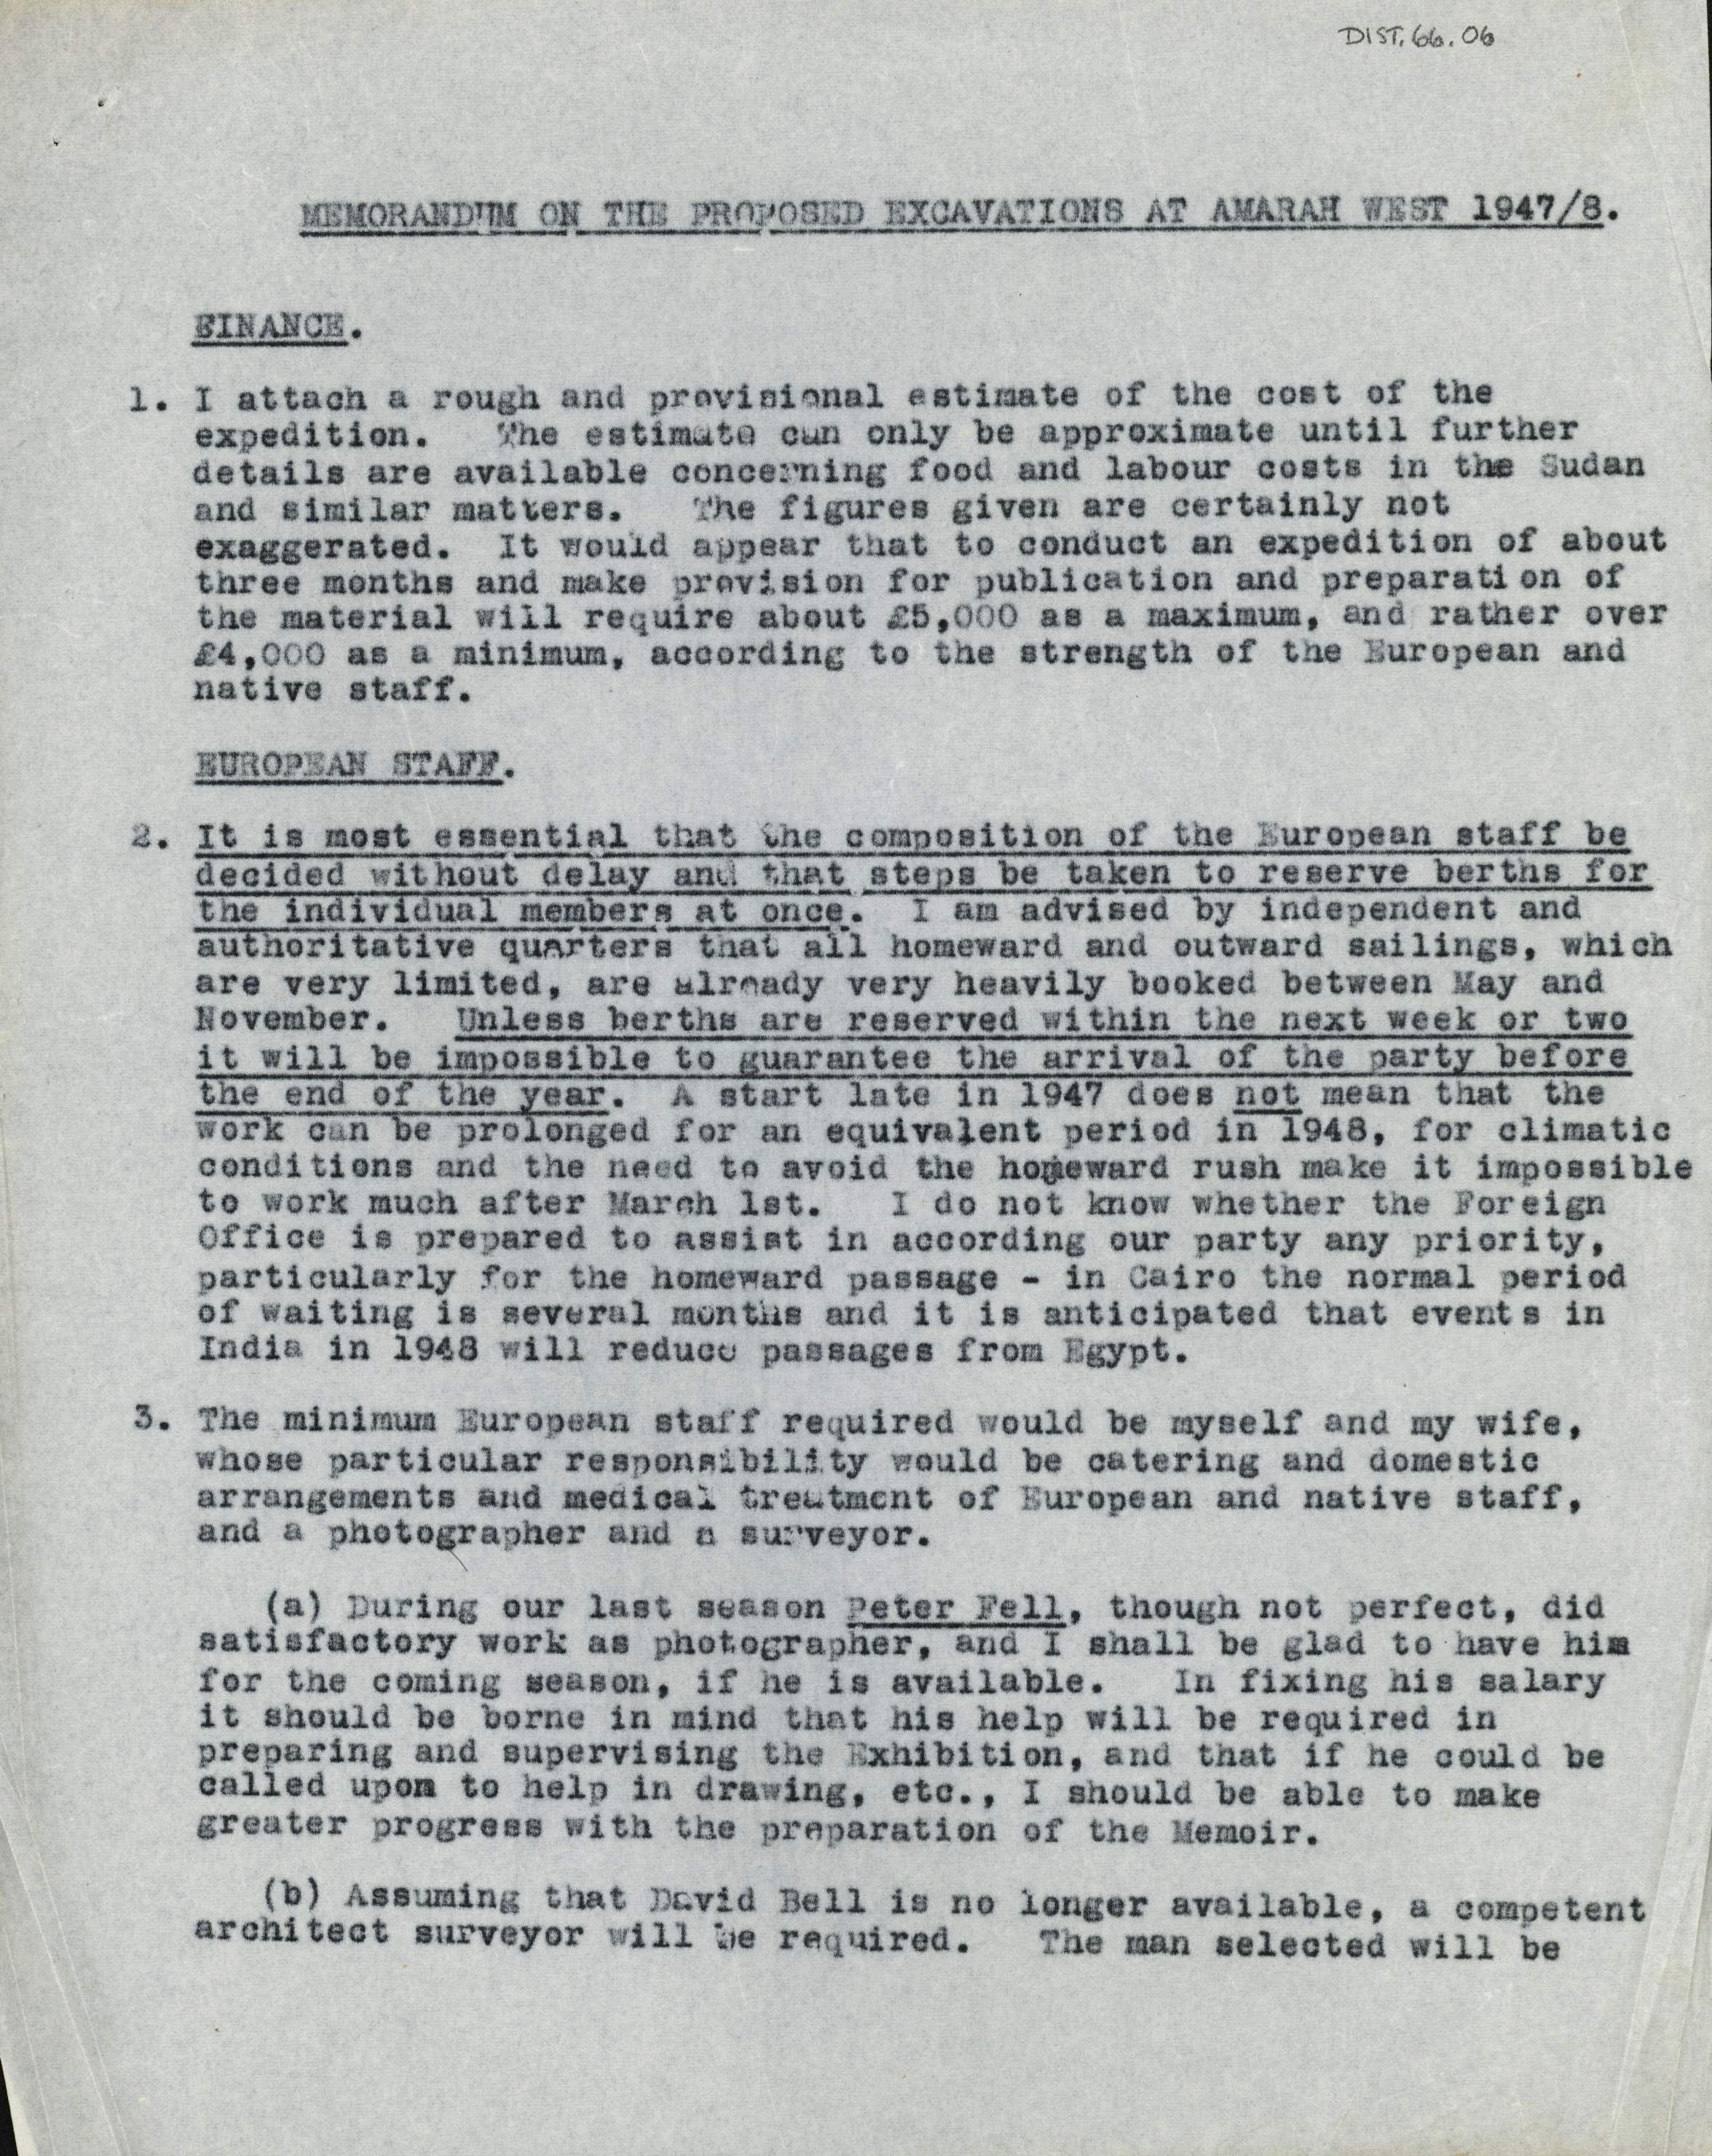 1947-54 Amarah West DIST.66.6a